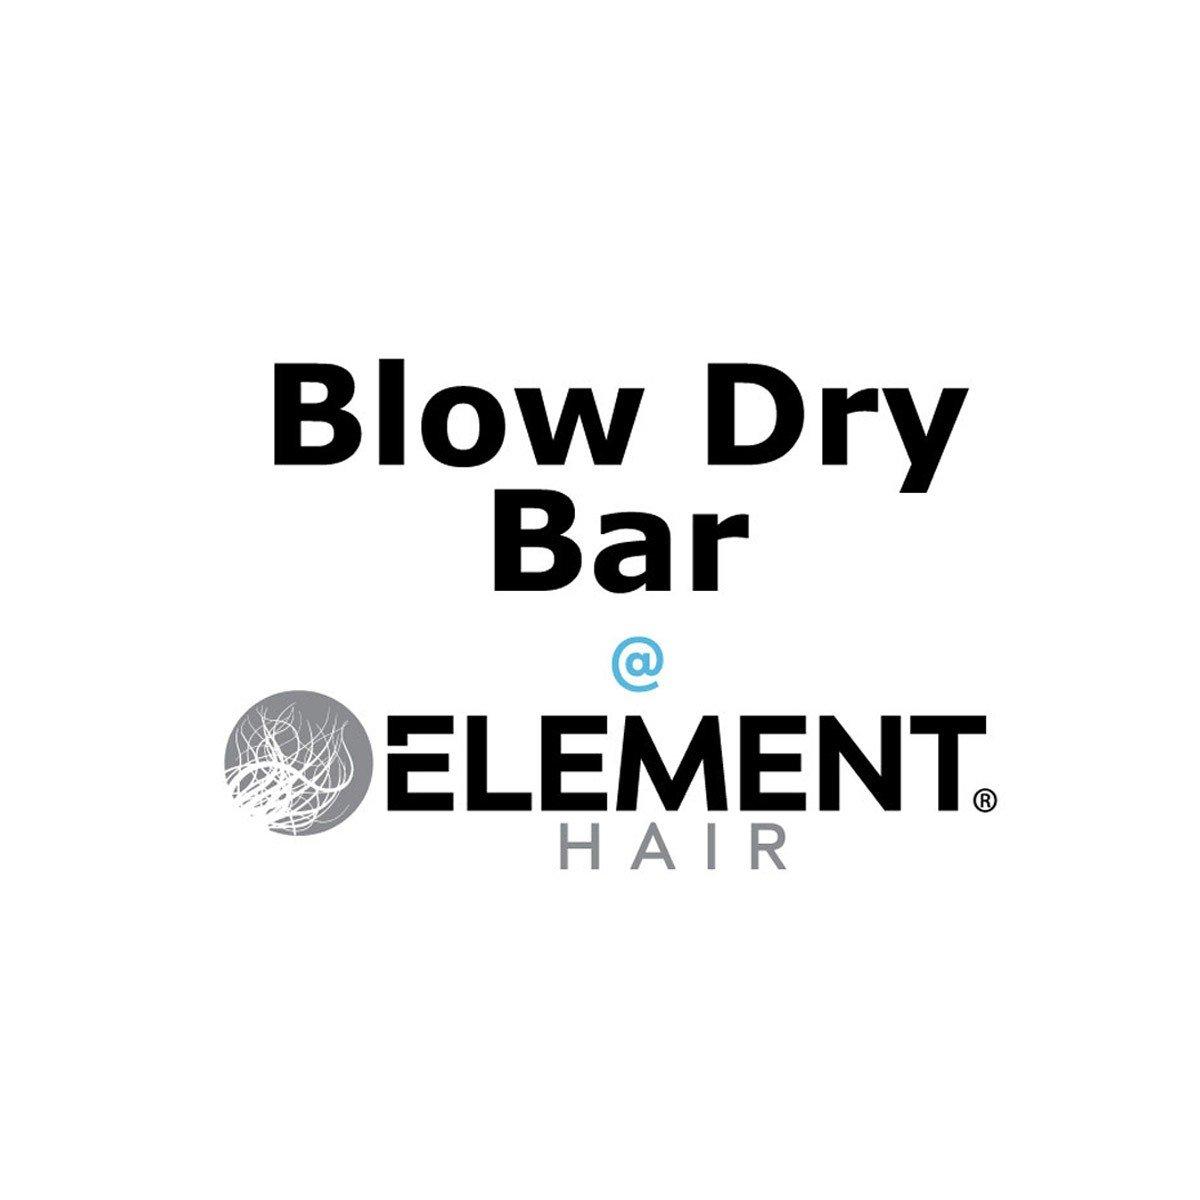 Blow dry bar blowouts Element Hair Salon